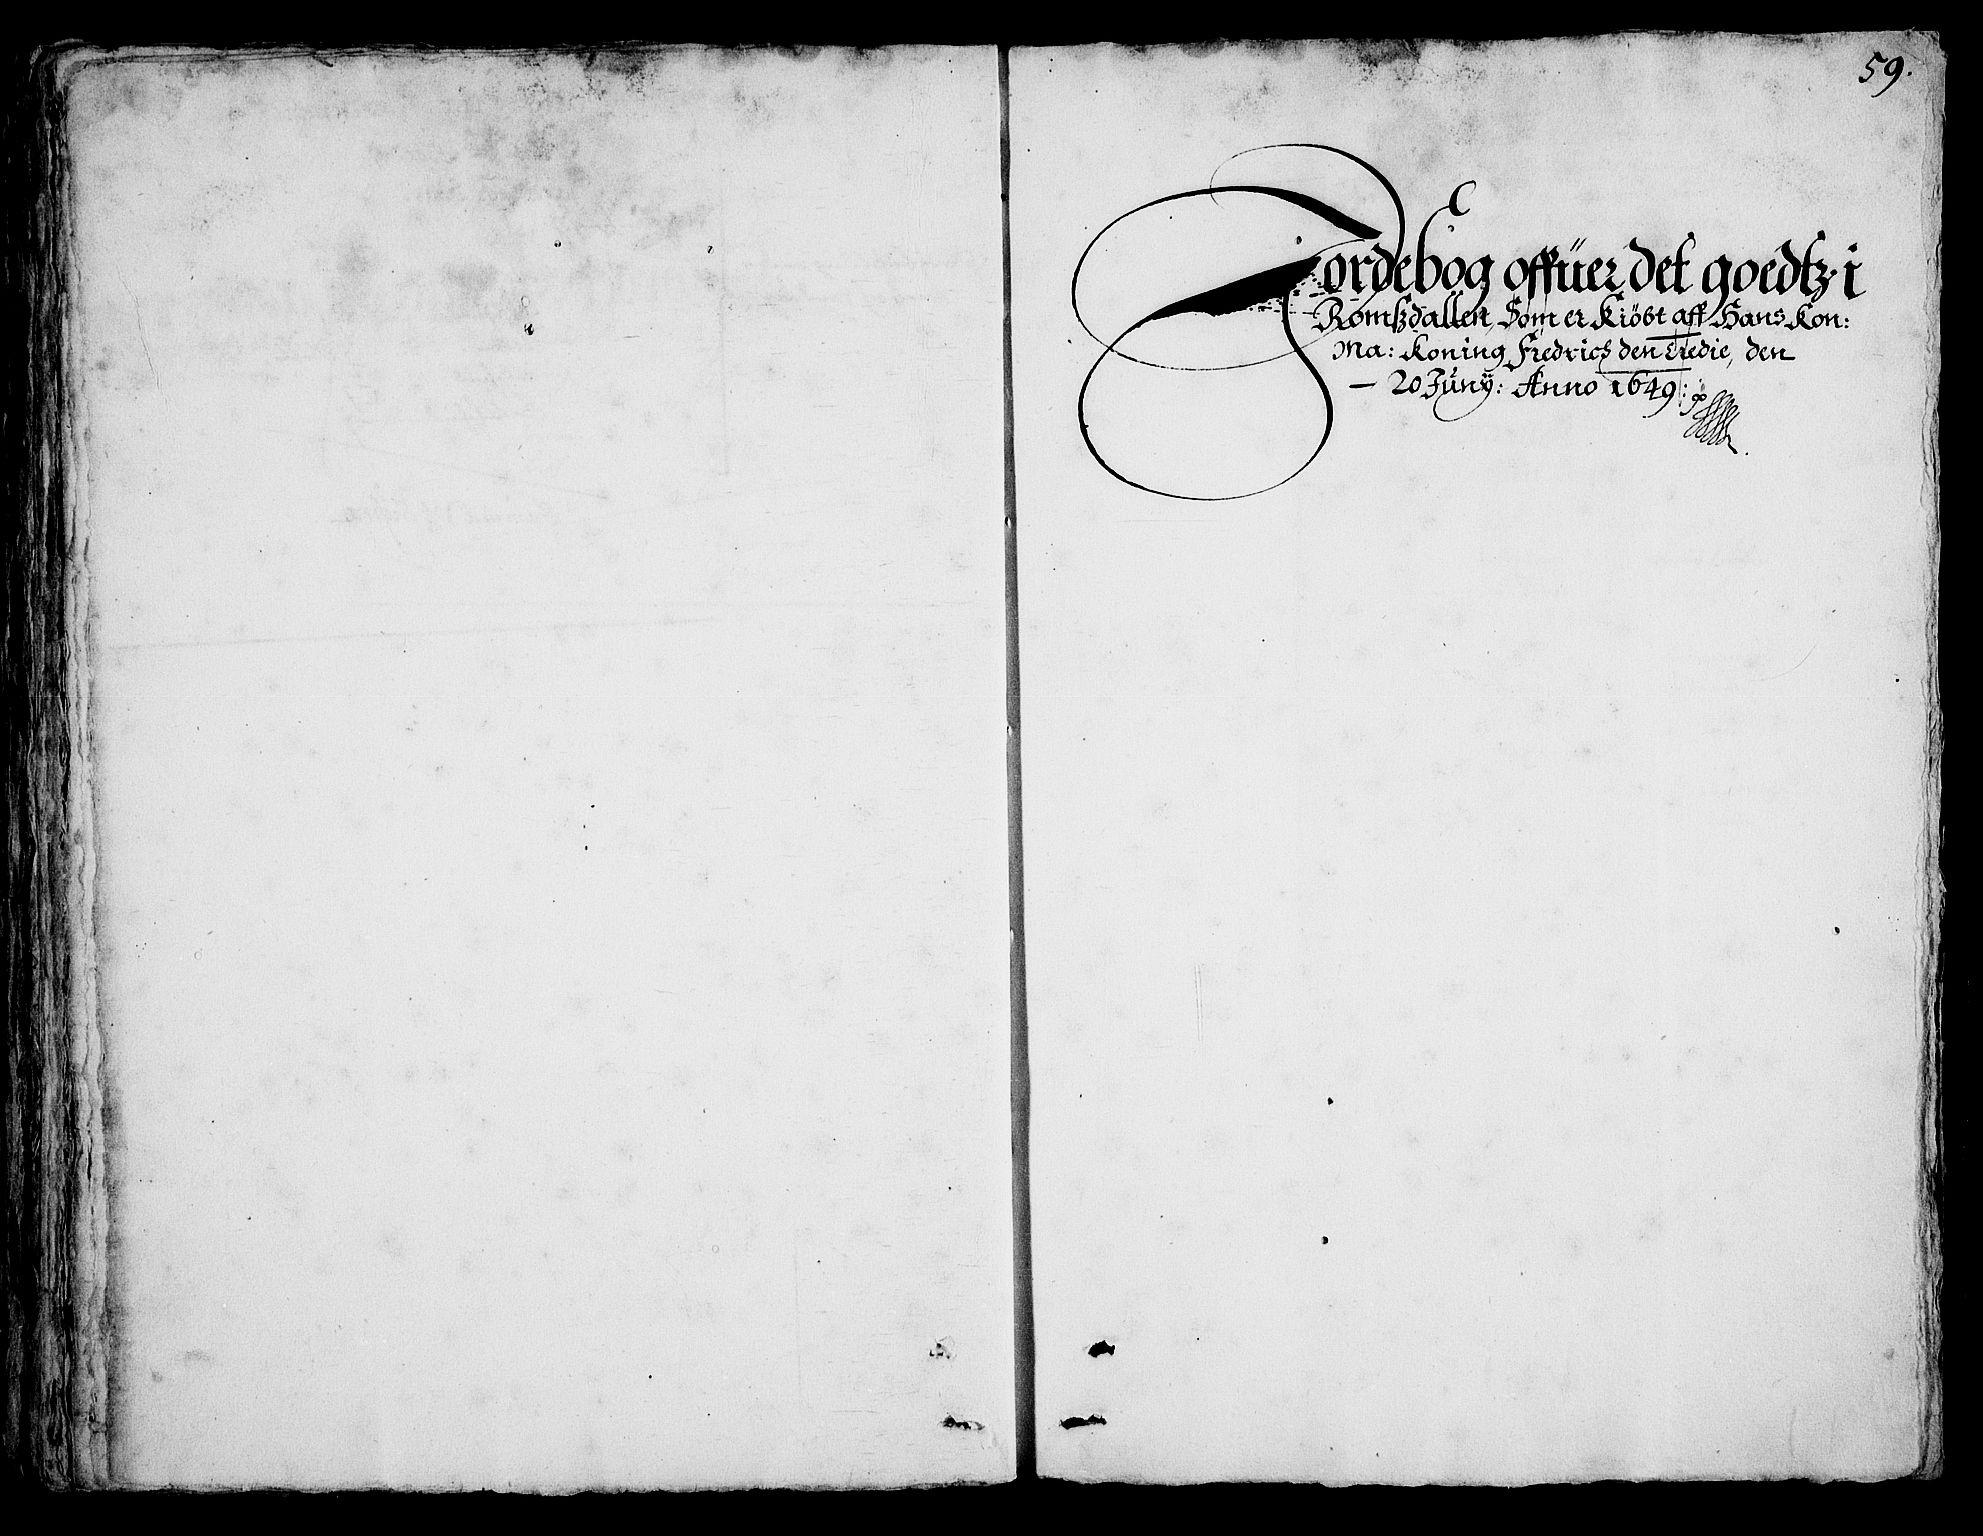 RA, Rentekammeret inntil 1814, Realistisk ordnet avdeling, On/L0001: Statens gods, 1651, s. 1058b-1059a